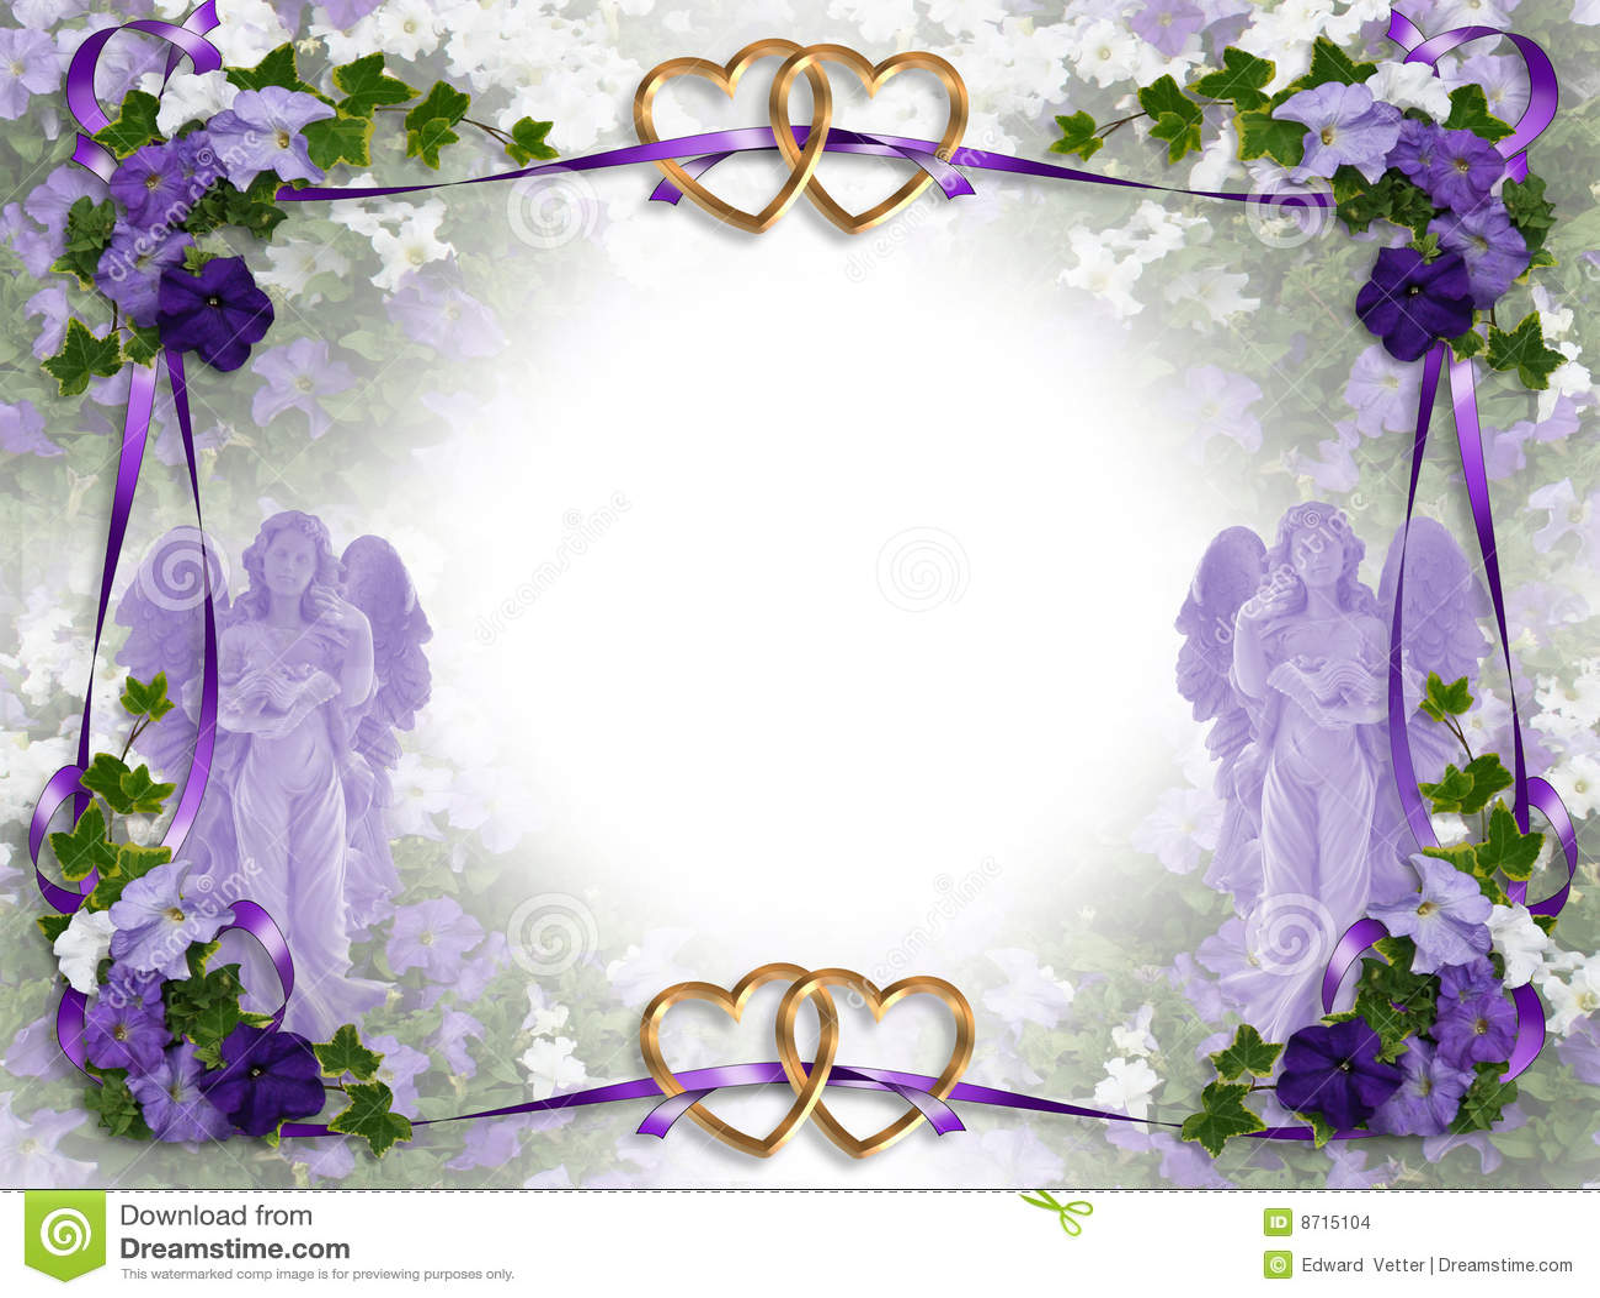 Wedding Invitation Victorian Angels Stock Illustration ...